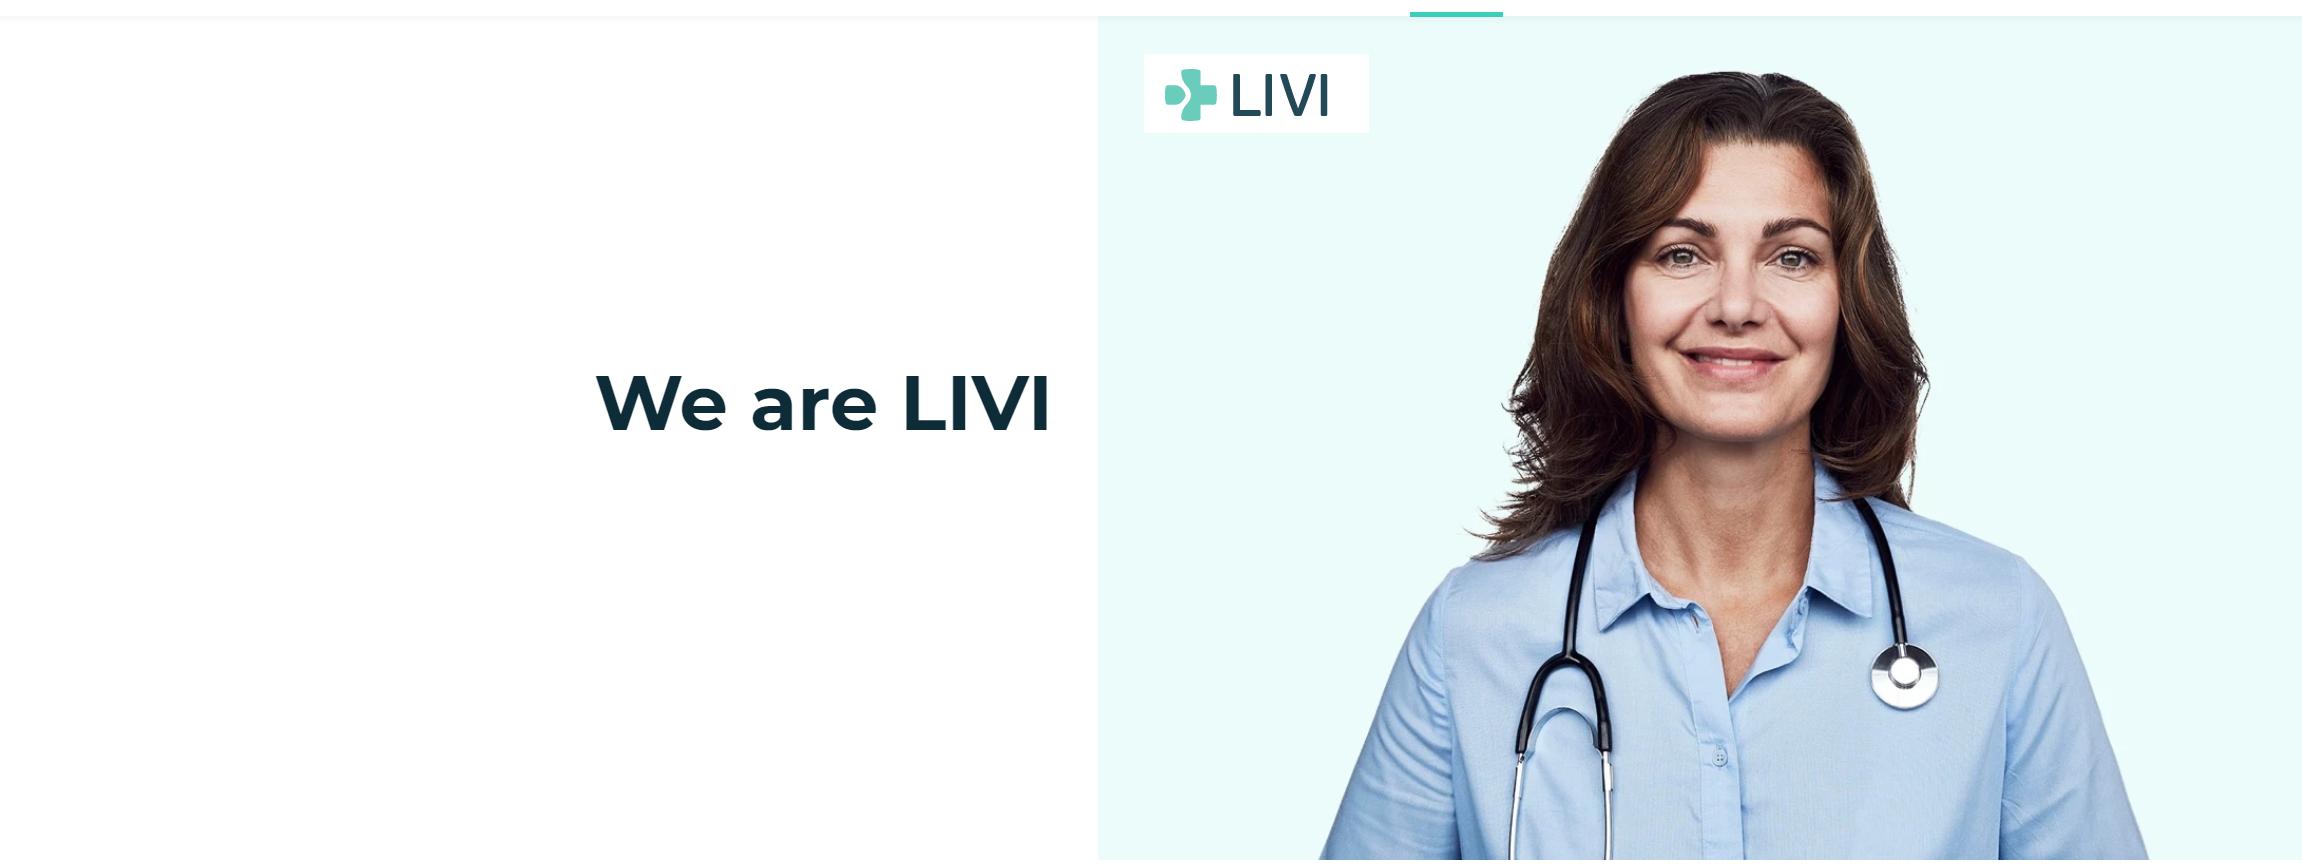 LIVI App